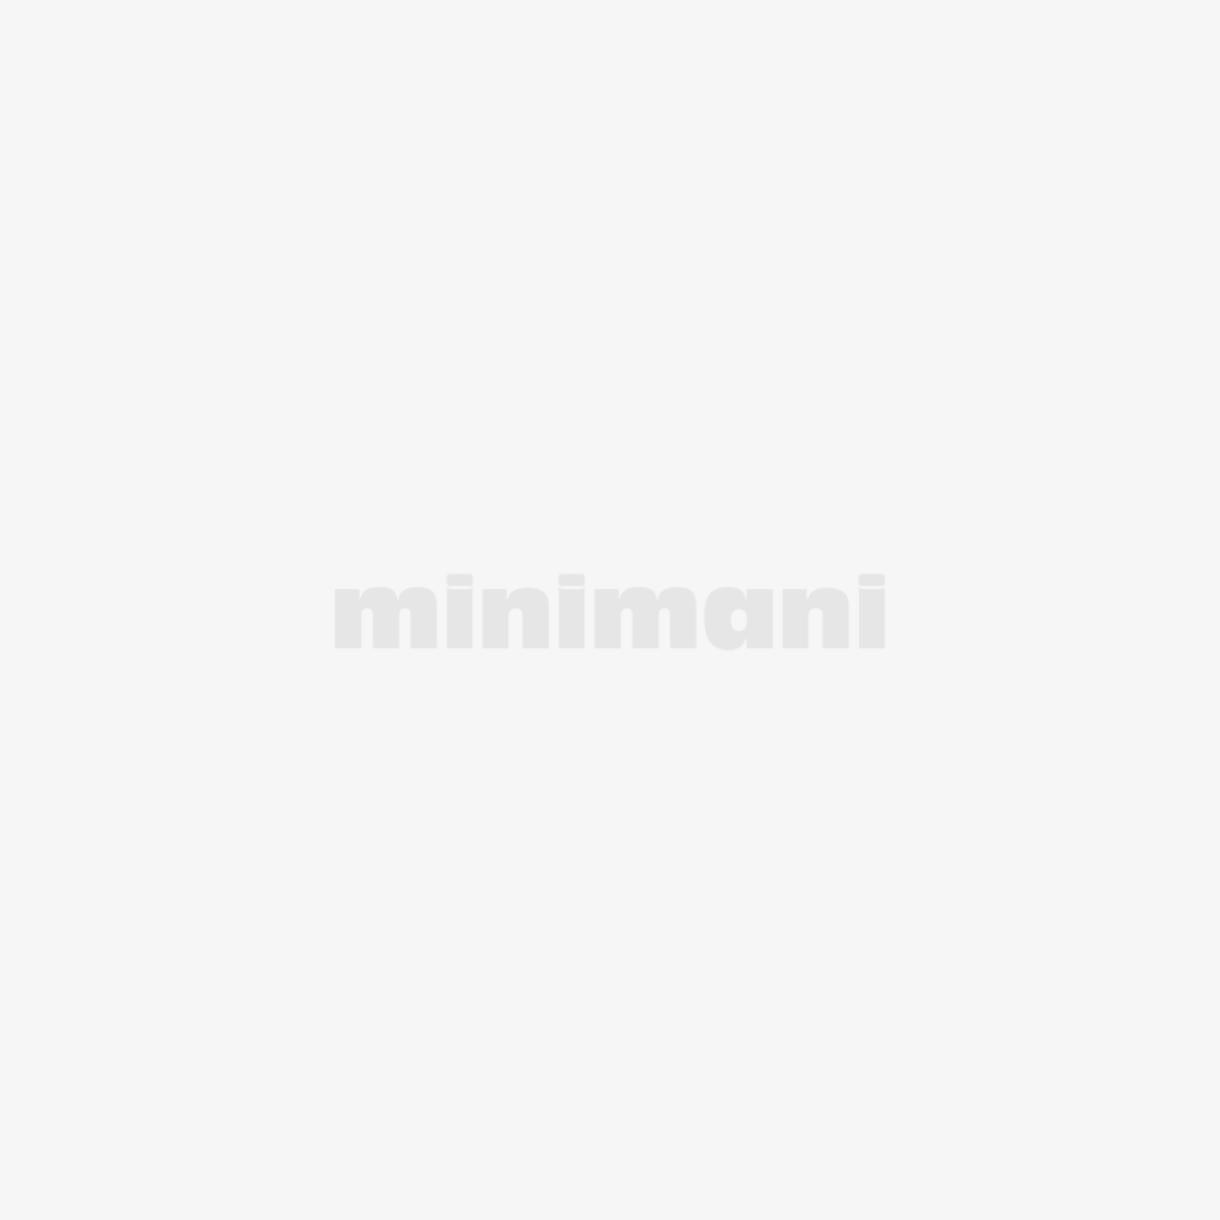 JALAS 9508 EXALTER2 S3  TURVAJALKINE KOKO 36